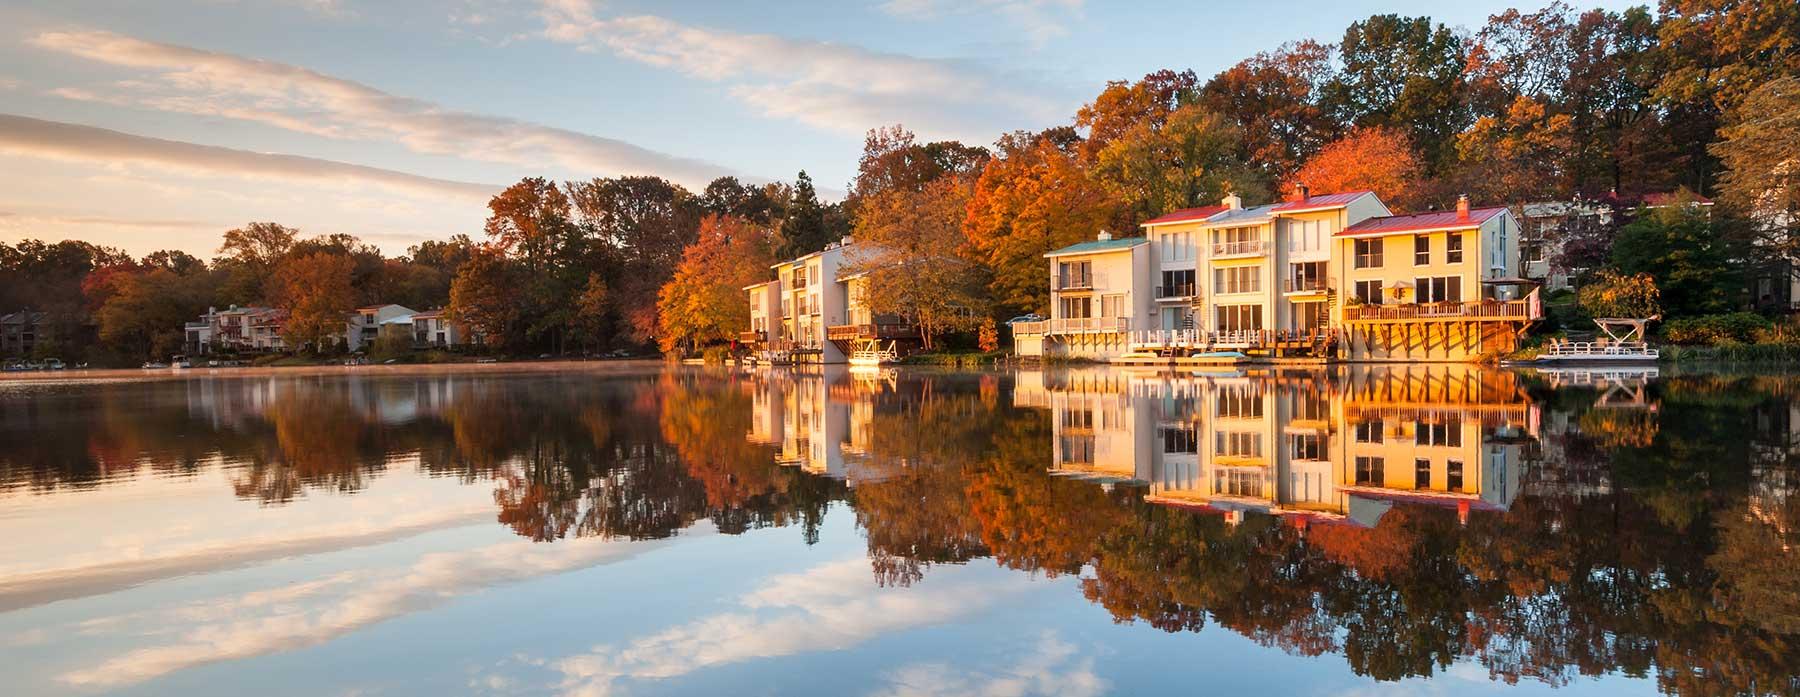 Virginia Living Links   Fairfax VA Homes For Sale | Fairfax Real Estate |  The Bill Davis Team Realty